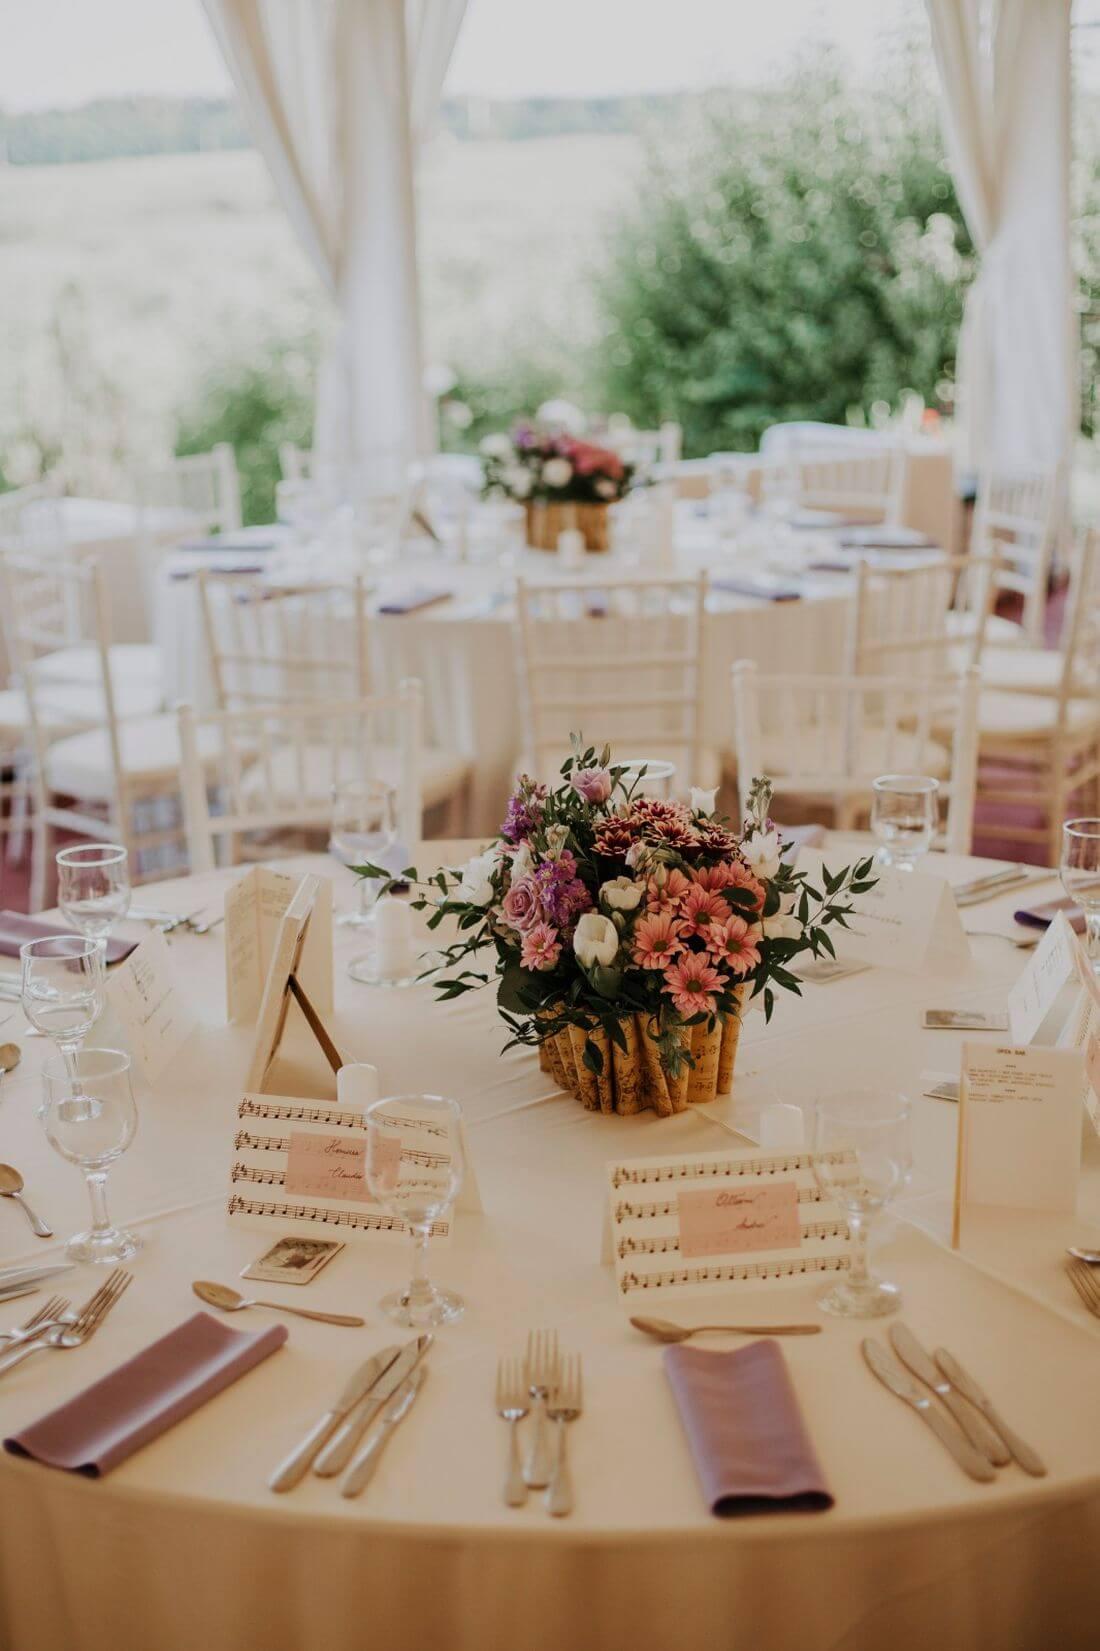 Nunta pe note muzicale – Ana-Maria si Robert – IDO-Weddings-nuntiinaerliber (6)